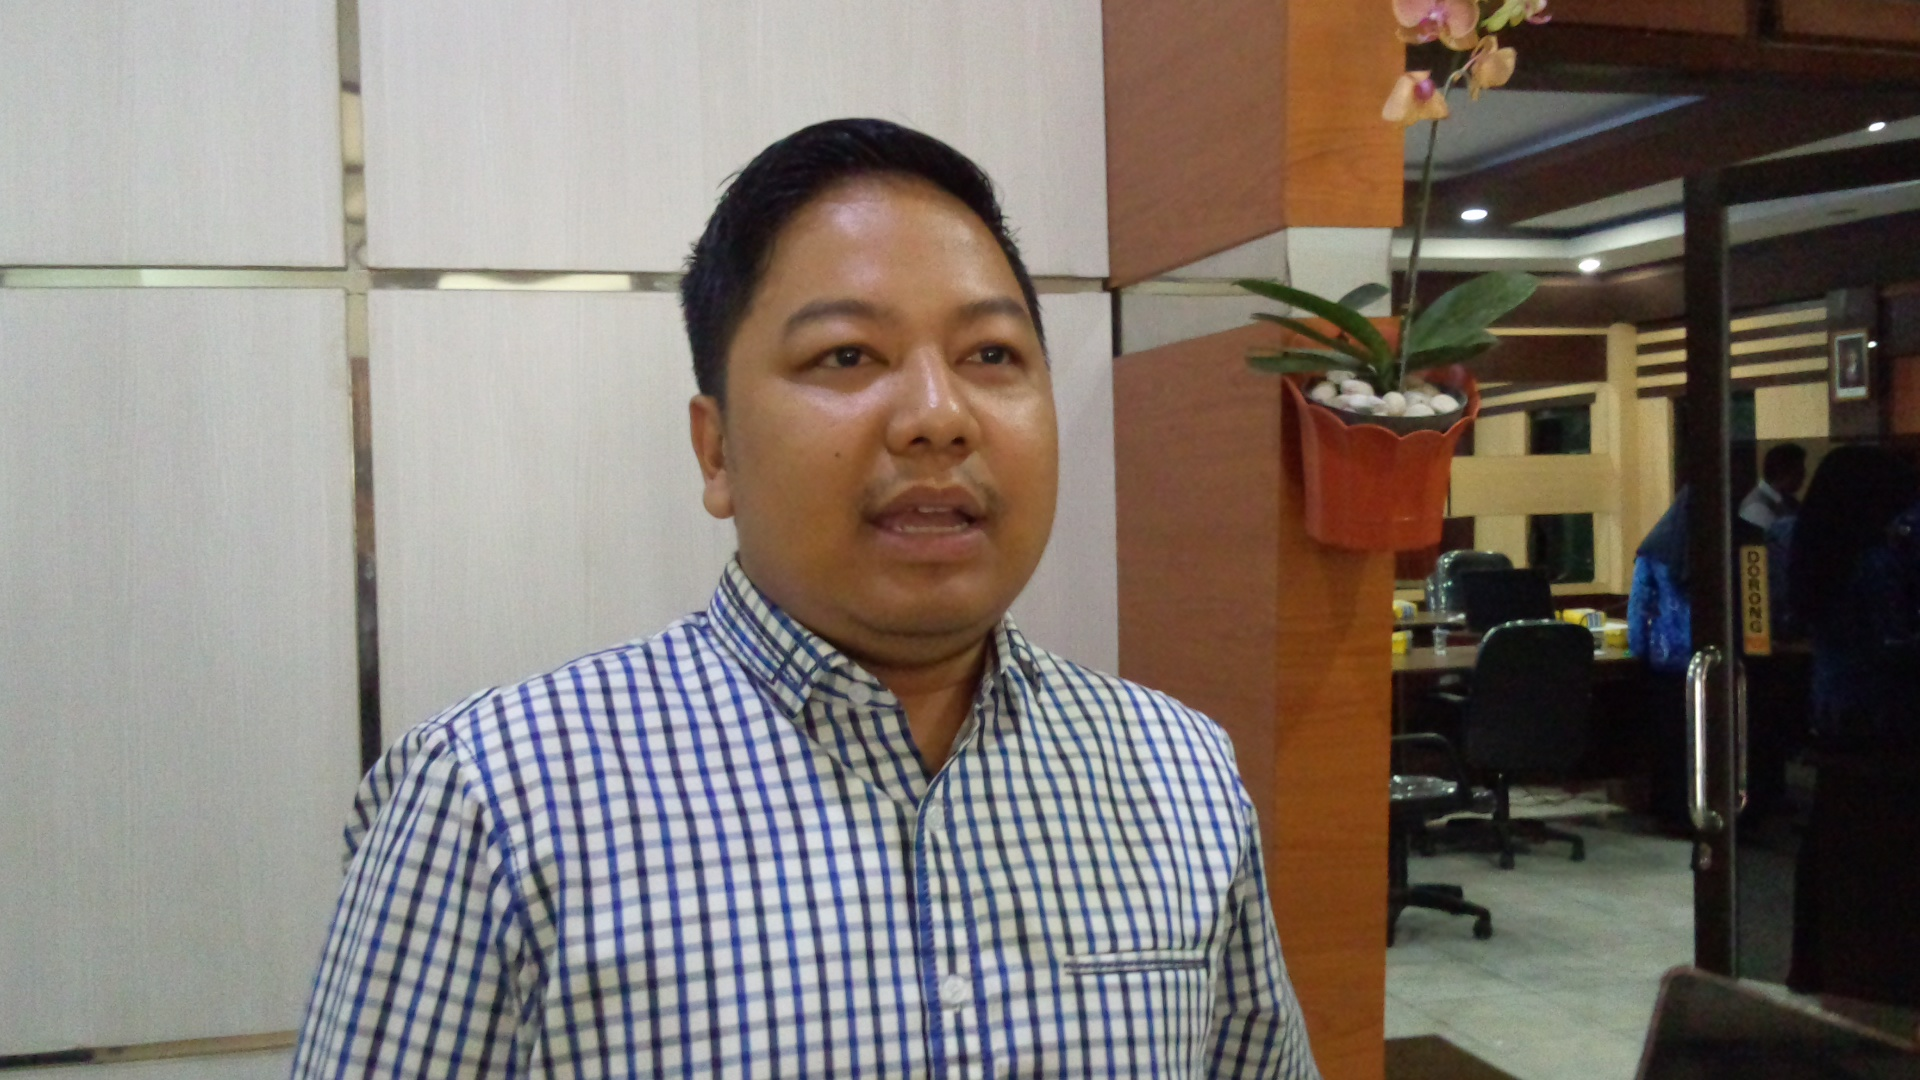 Ketua DPRD Banjar Usulan Penundaan Pilkada Secara Parsial Ke Bawaslu RI 42